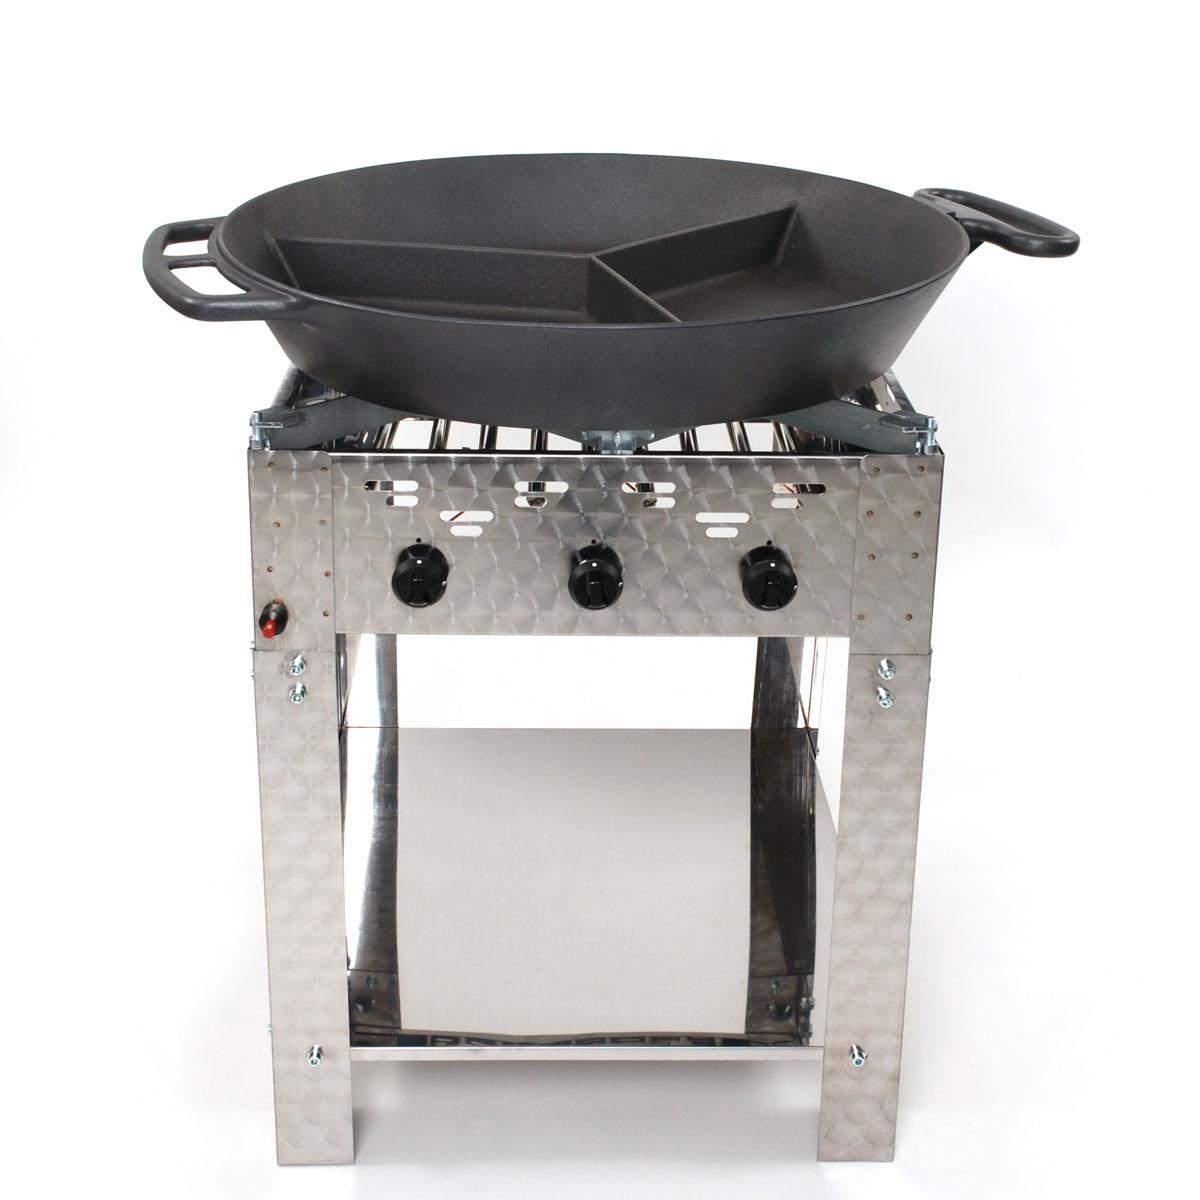 Hockerkocher / Großpfannengeräte